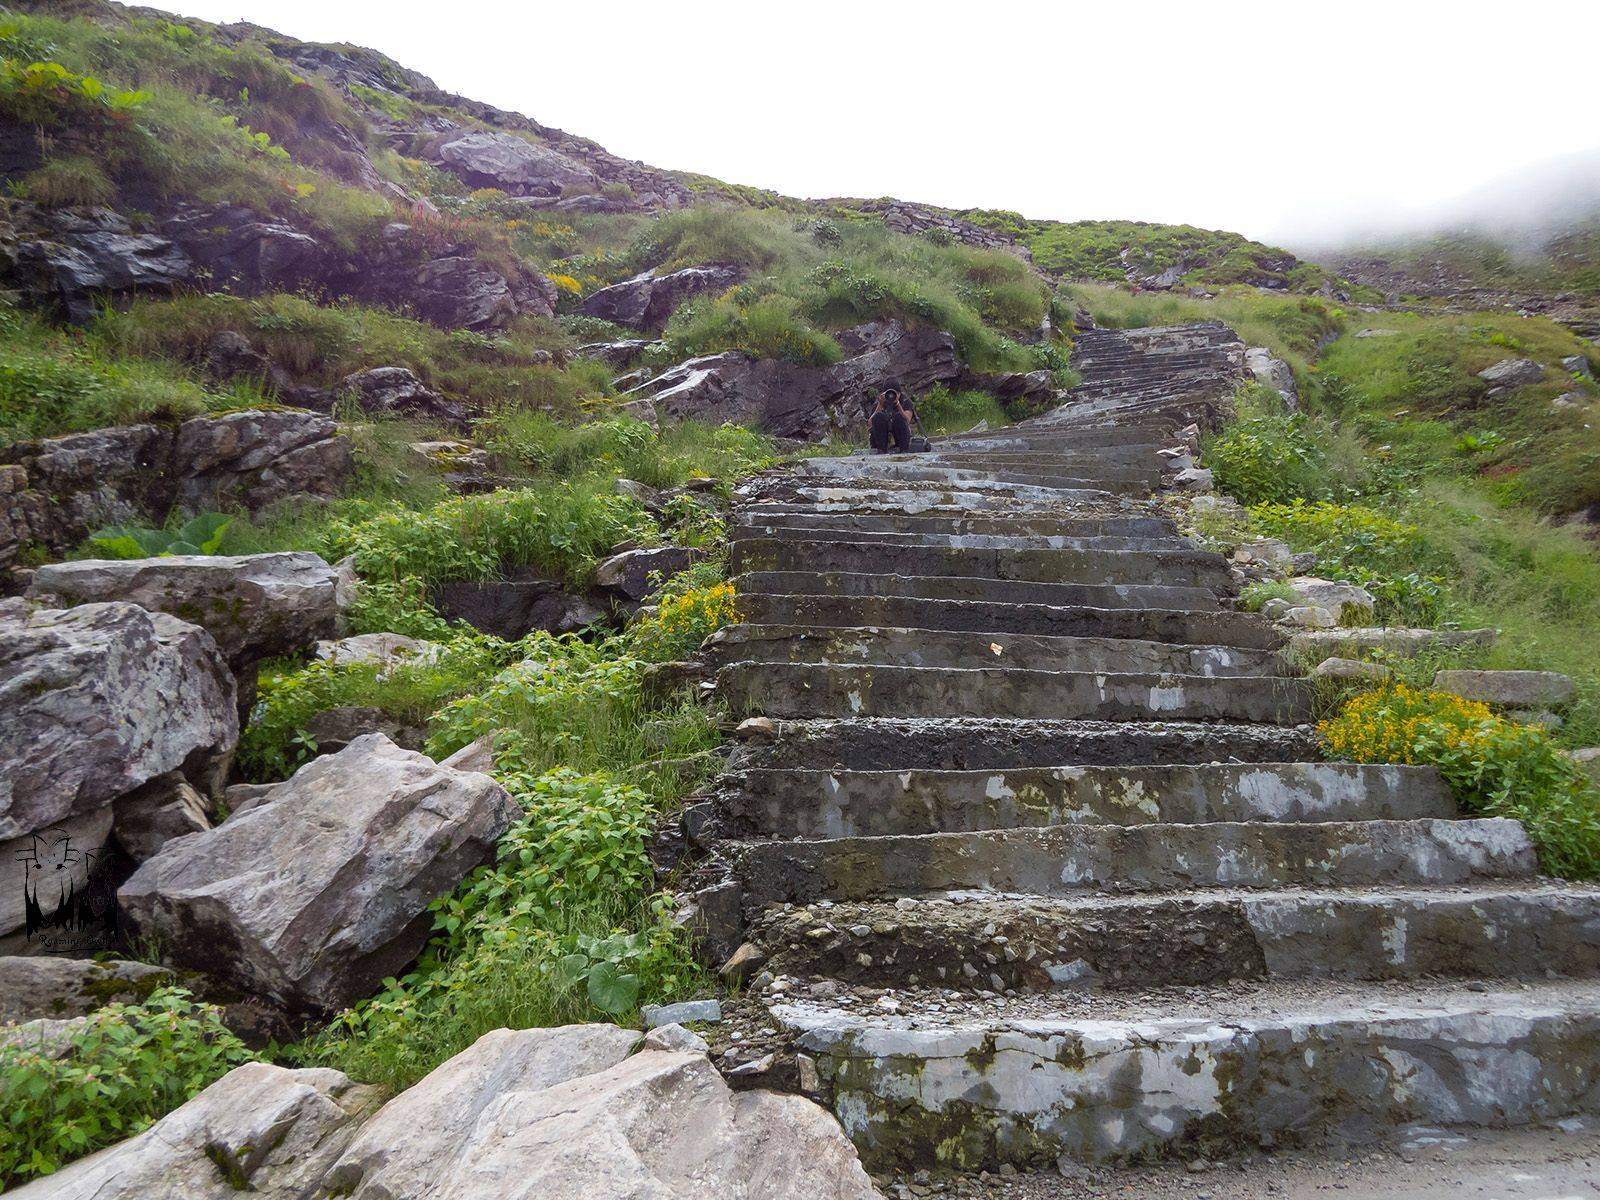 Hemkund trek,Hemkund no horse trail,Paulmathi Vinod,Ghangaria Hemkund Valley of flowers